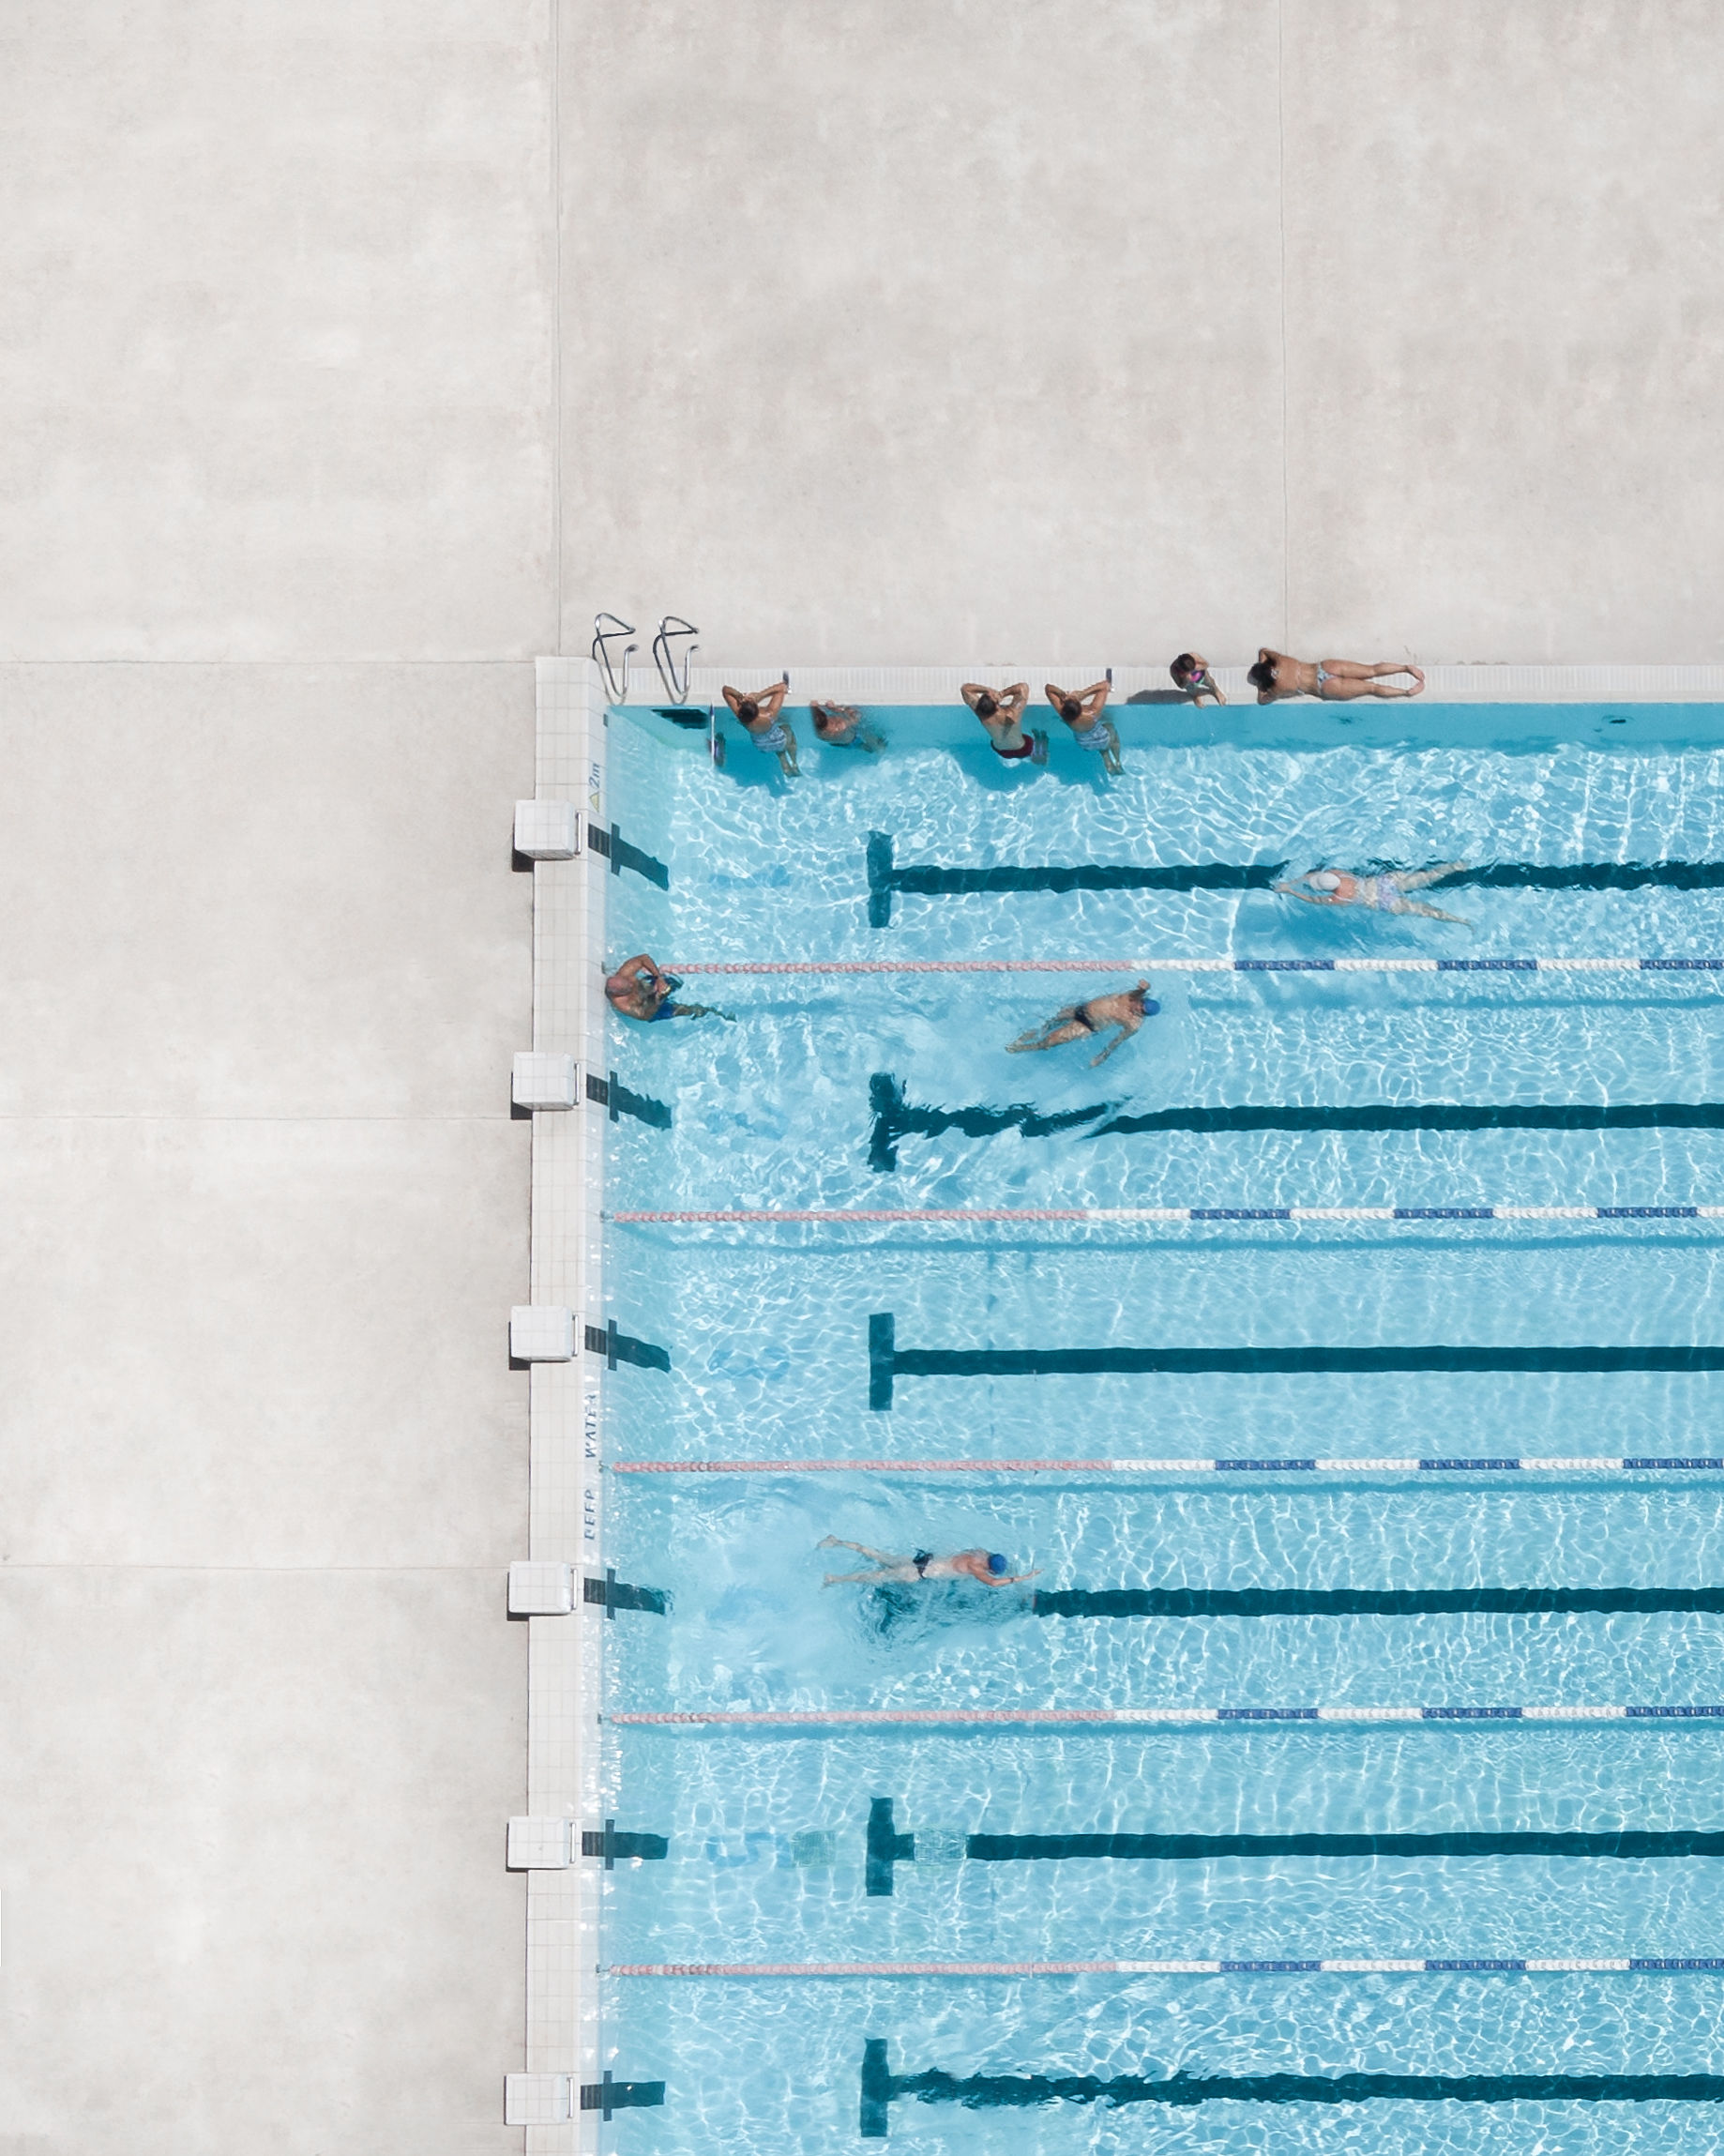 Survival-Juice_public-pool-Prince-Albert-Park-Pool-Sydney